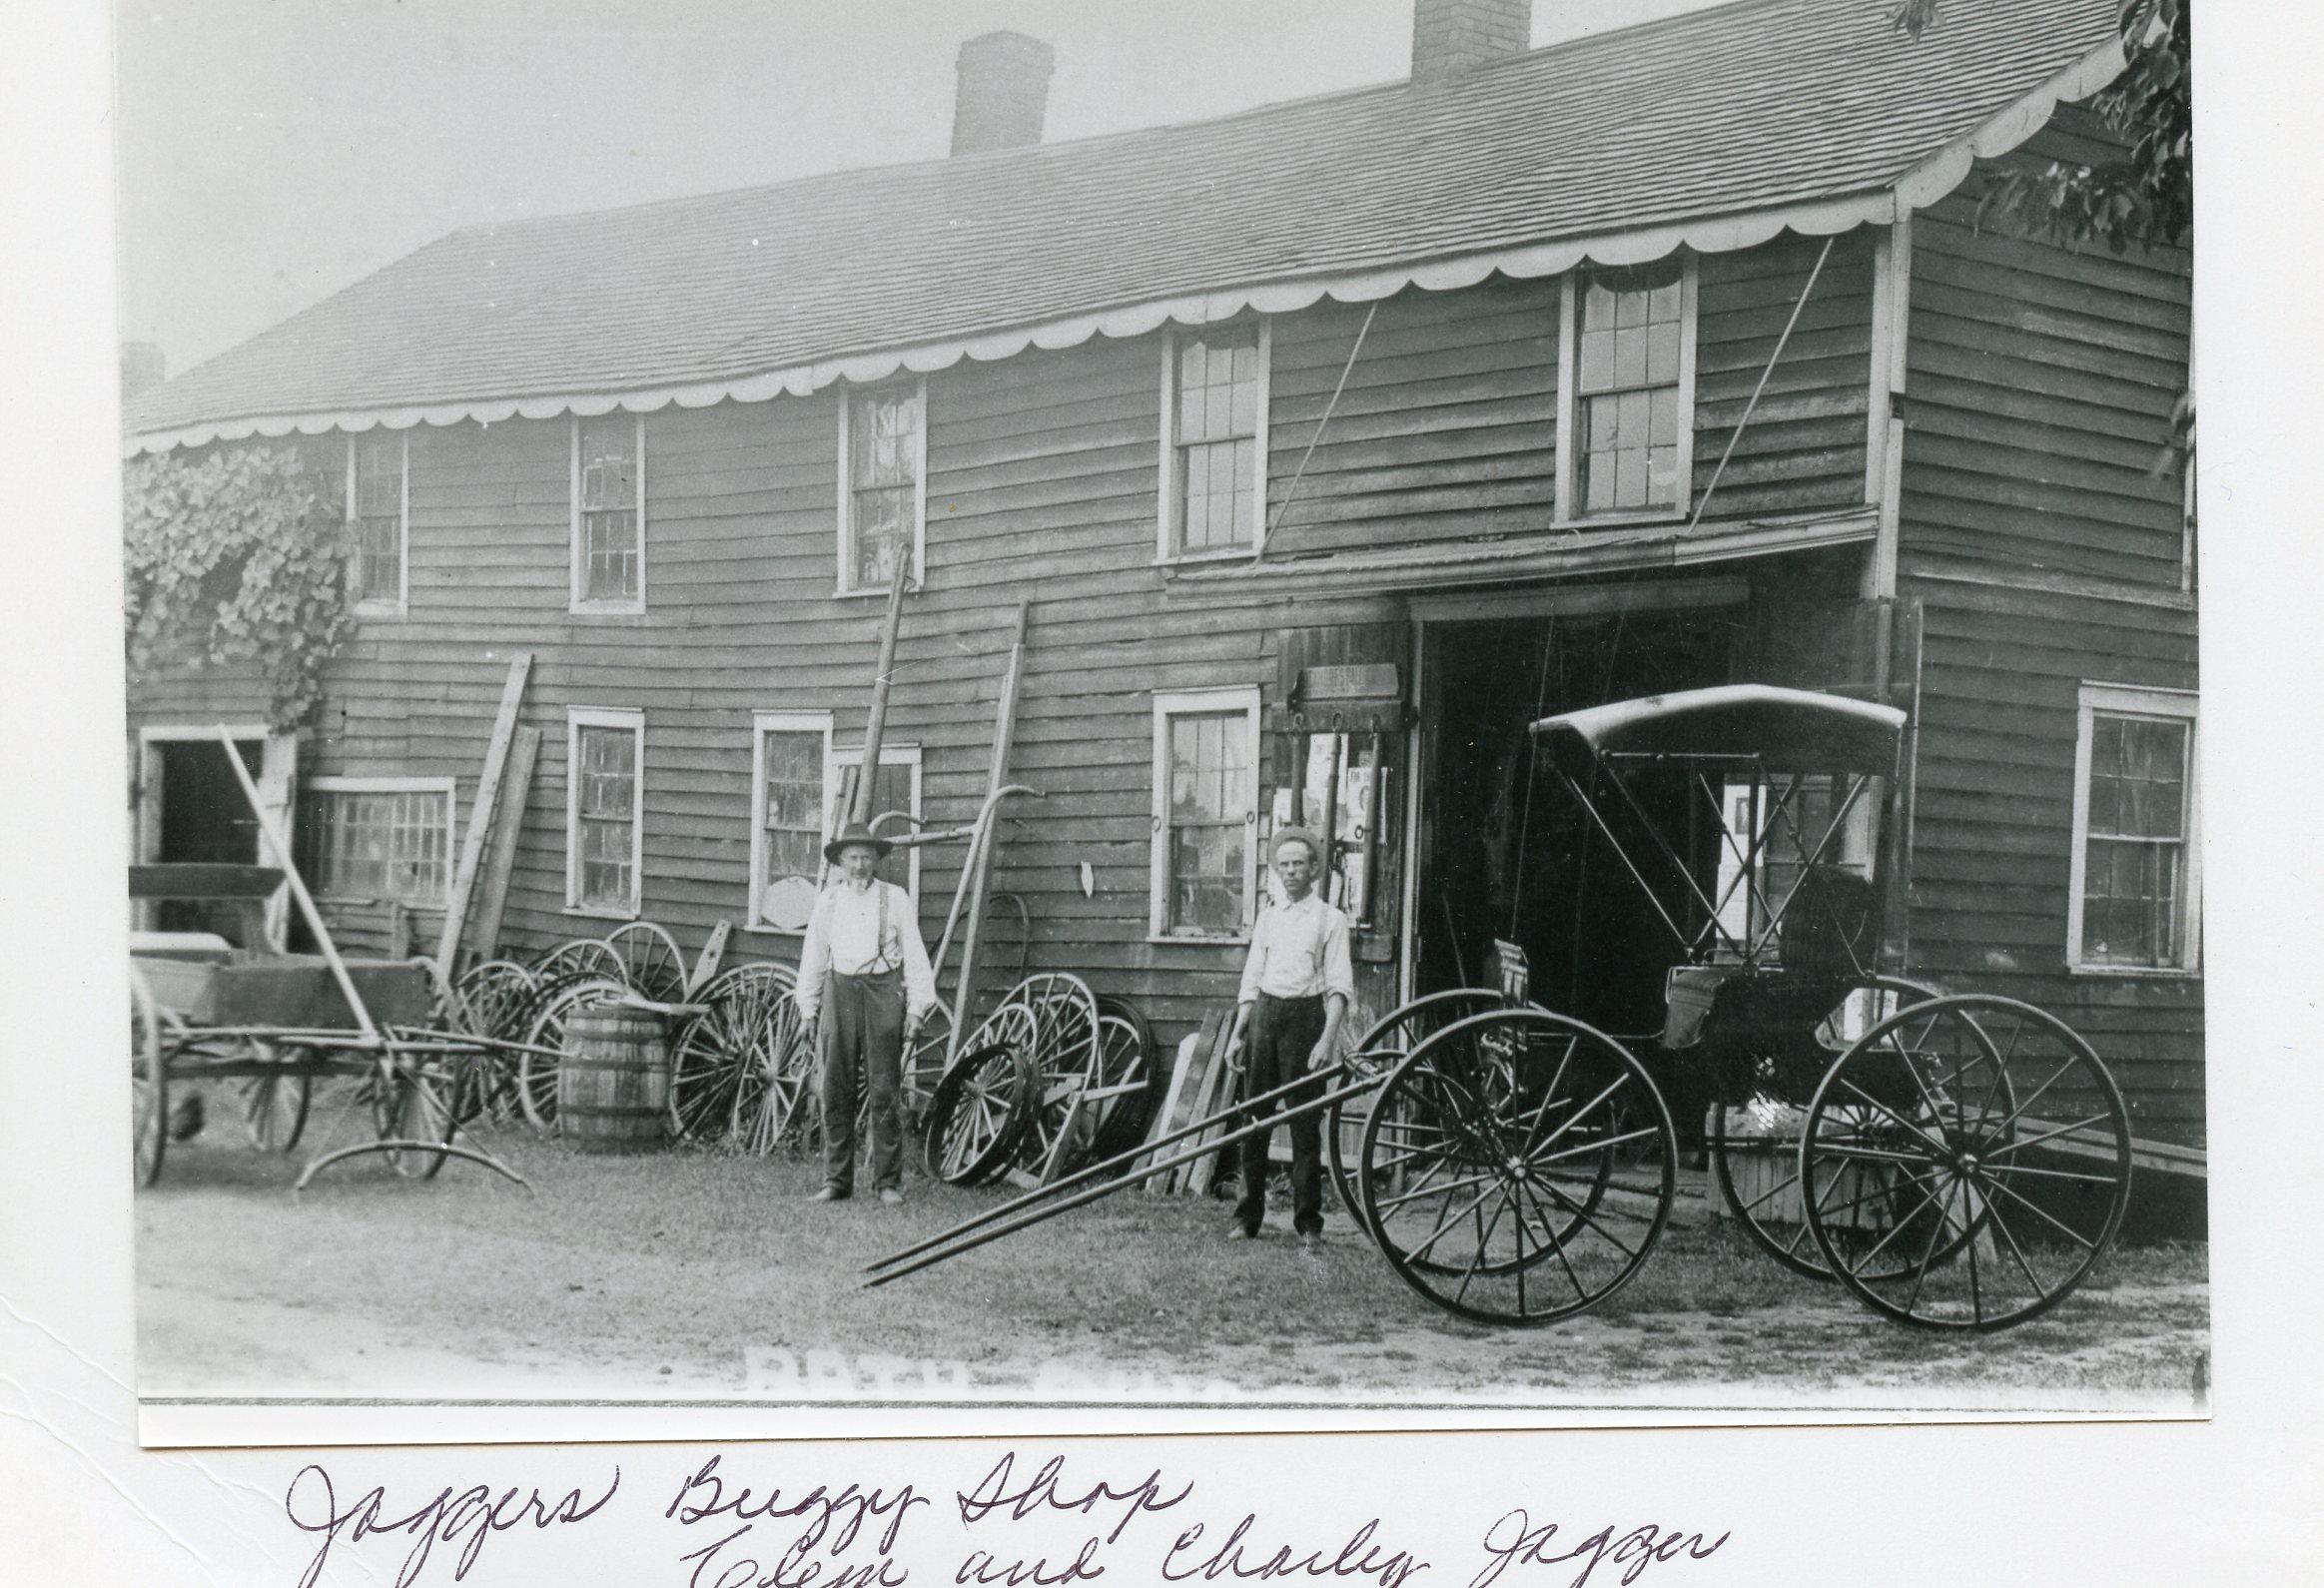 Jagger Wagon Shop